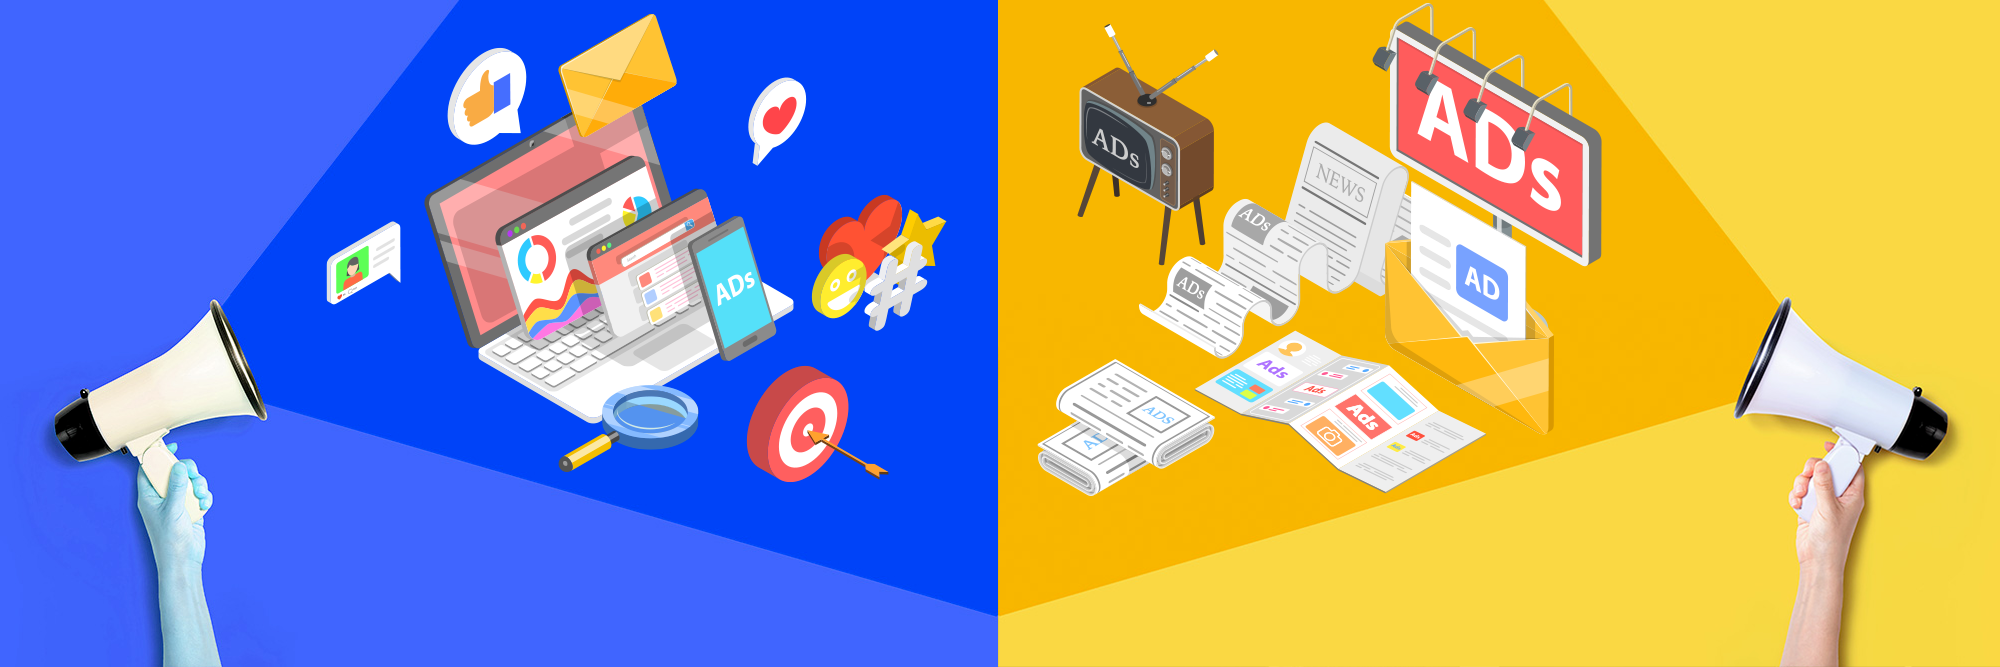 Digital vs. Traditional Marketing